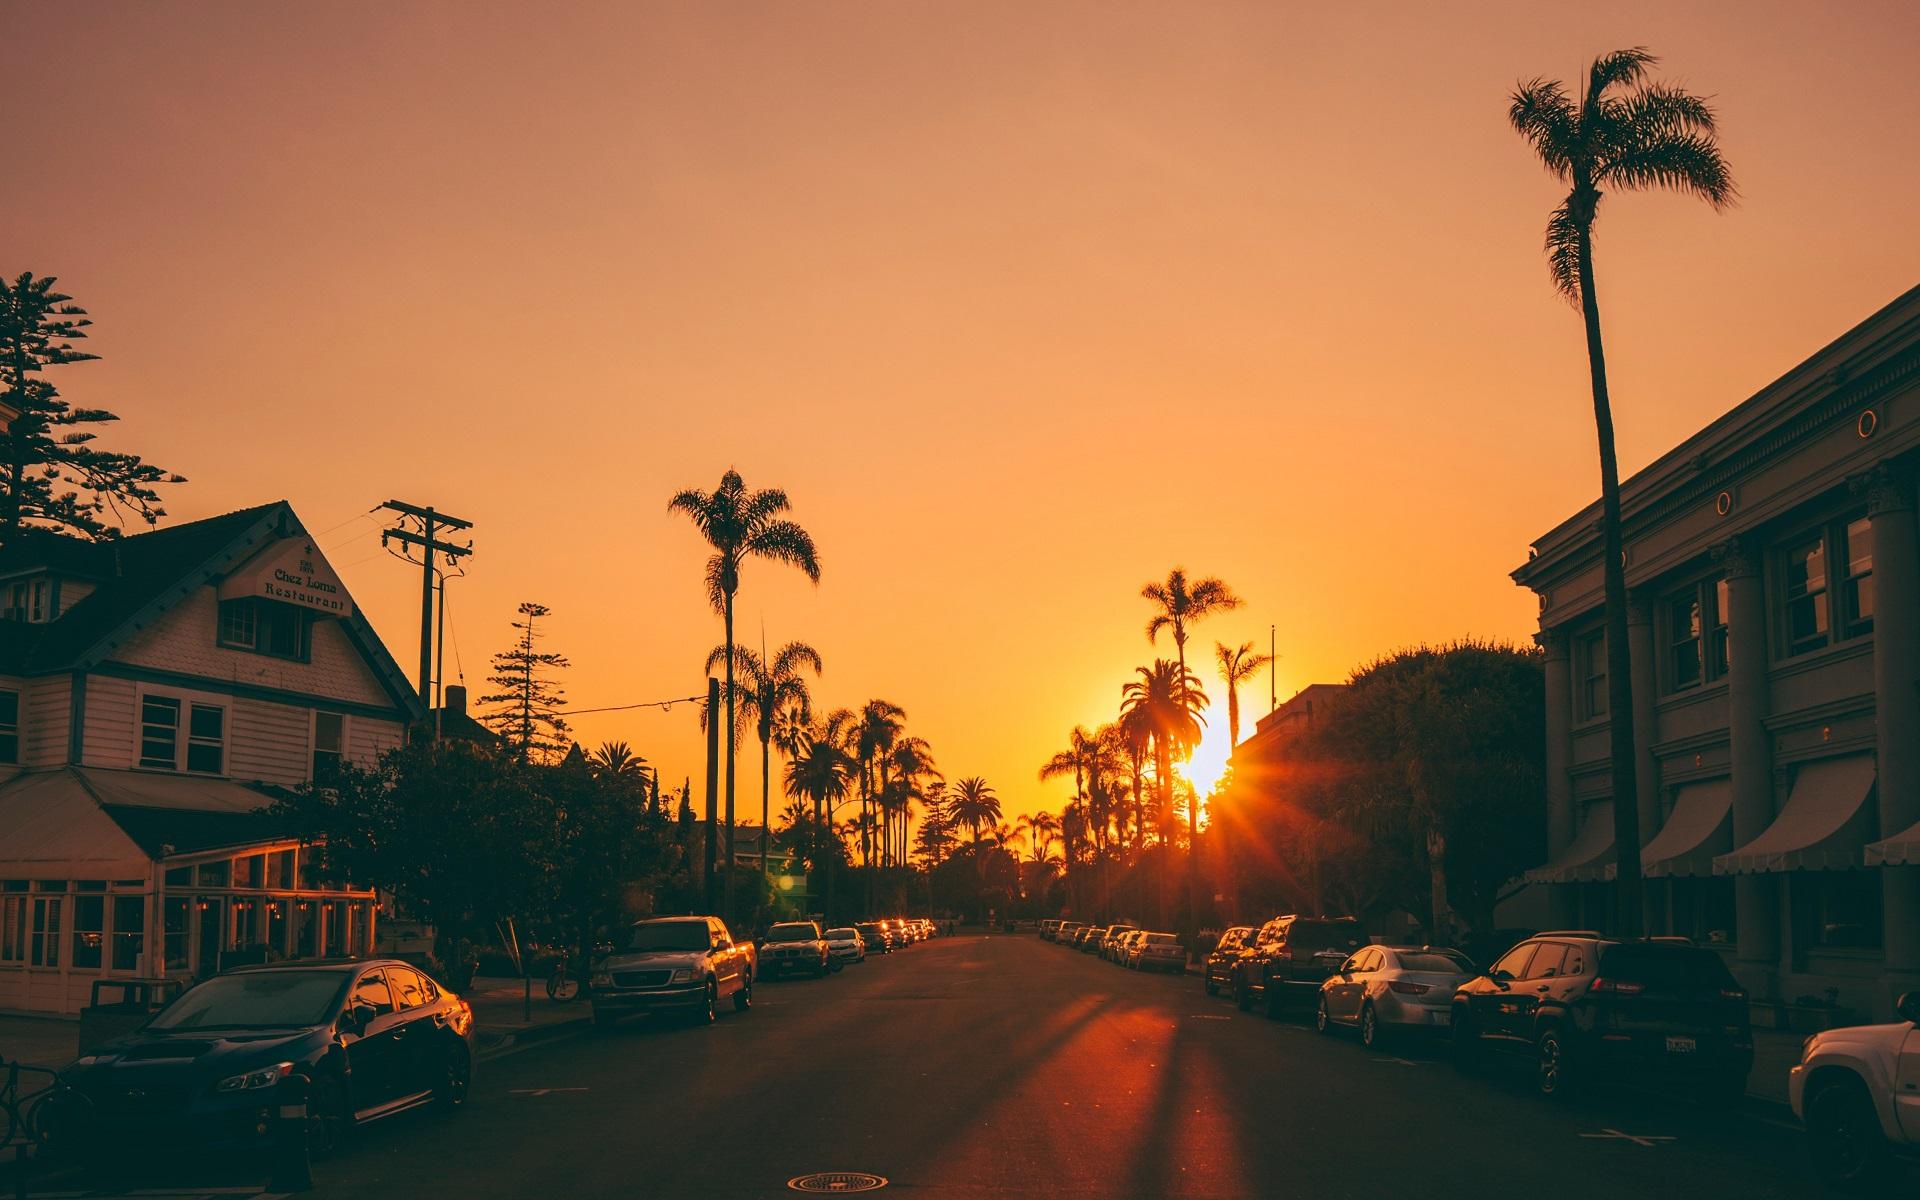 General 1920x1200 city road palm trees Sun sunset street sunlight urban car